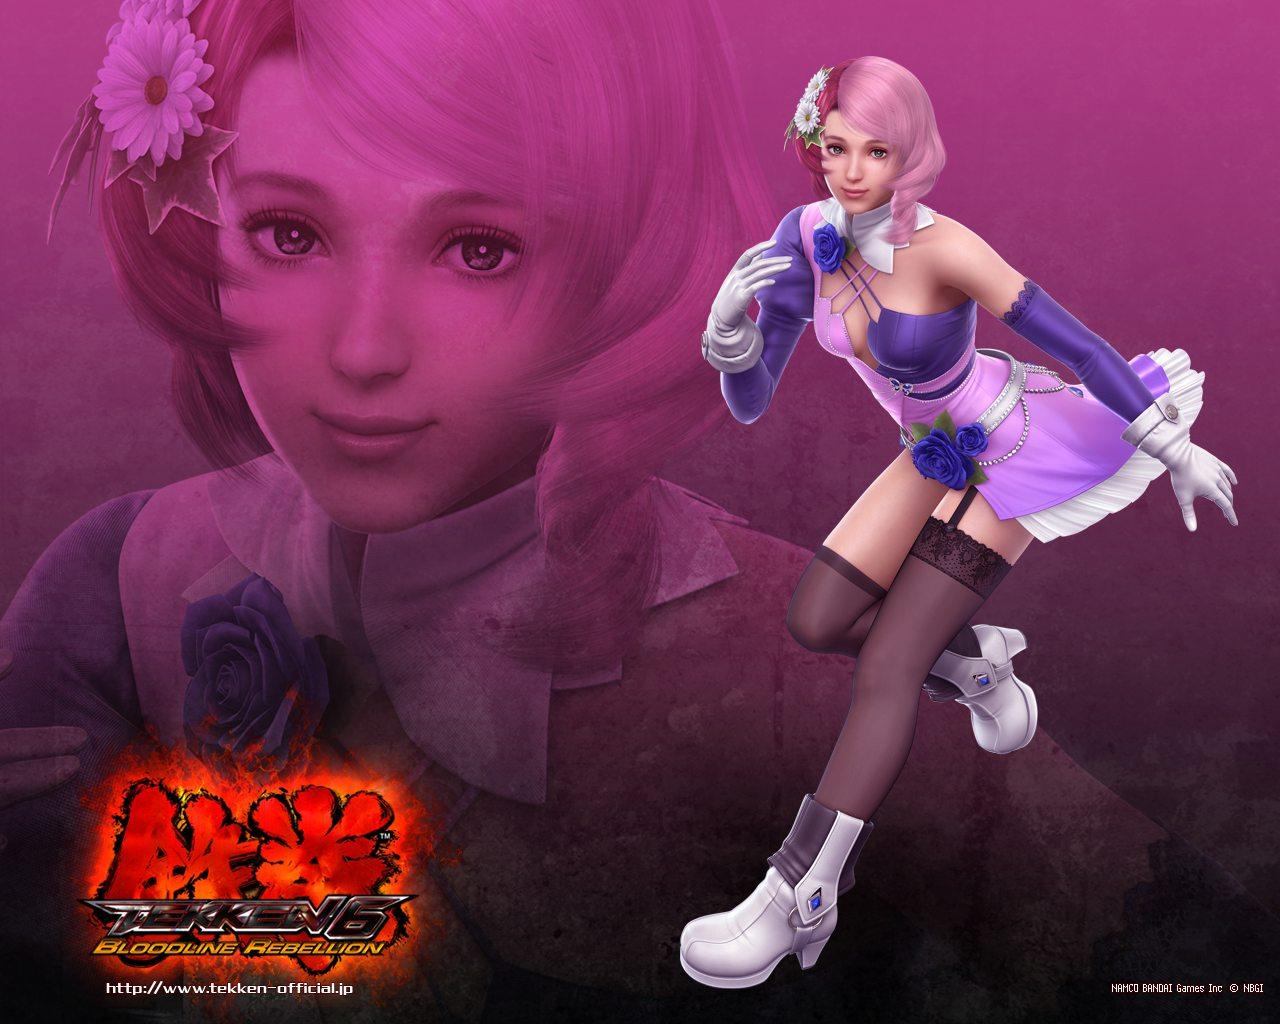 http://3.bp.blogspot.com/_tfv2hxvU3WE/TR98QJmbAhI/AAAAAAAACa4/Y39hOAA1JEE/s1600/Tekken-6-Alisa.jpg